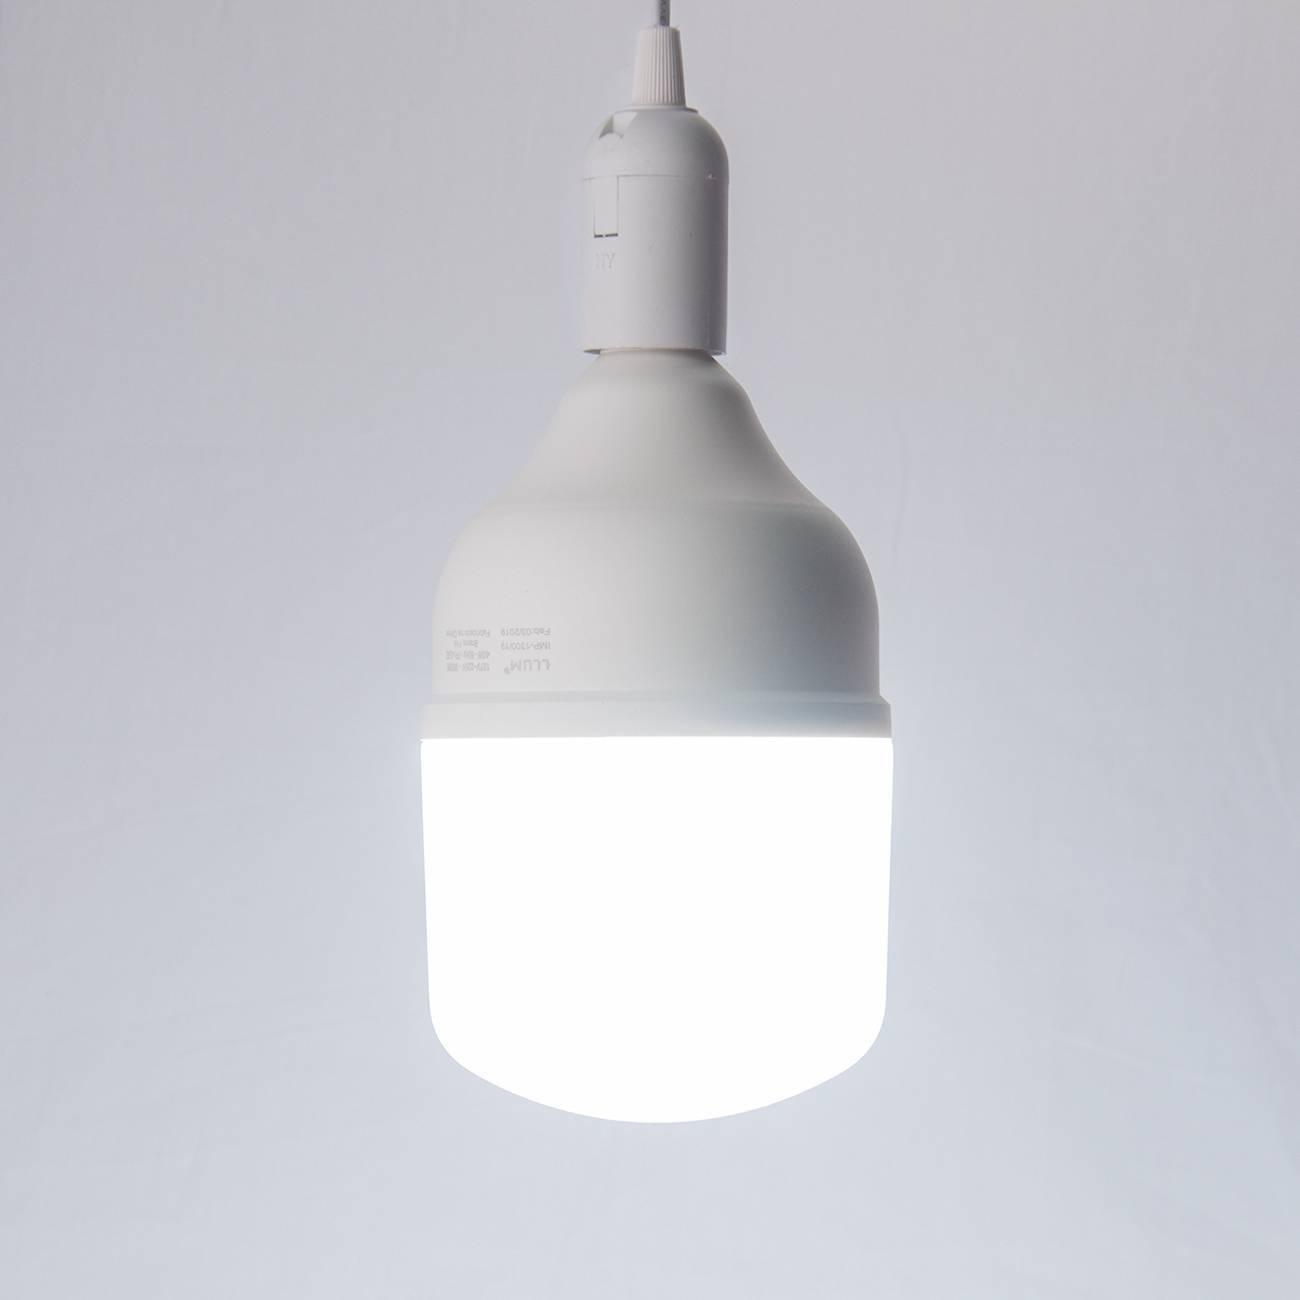 Lâmpada Led Bulbo High Llum 40w Luz Branca 6500k Bivolt - LCGELETRO